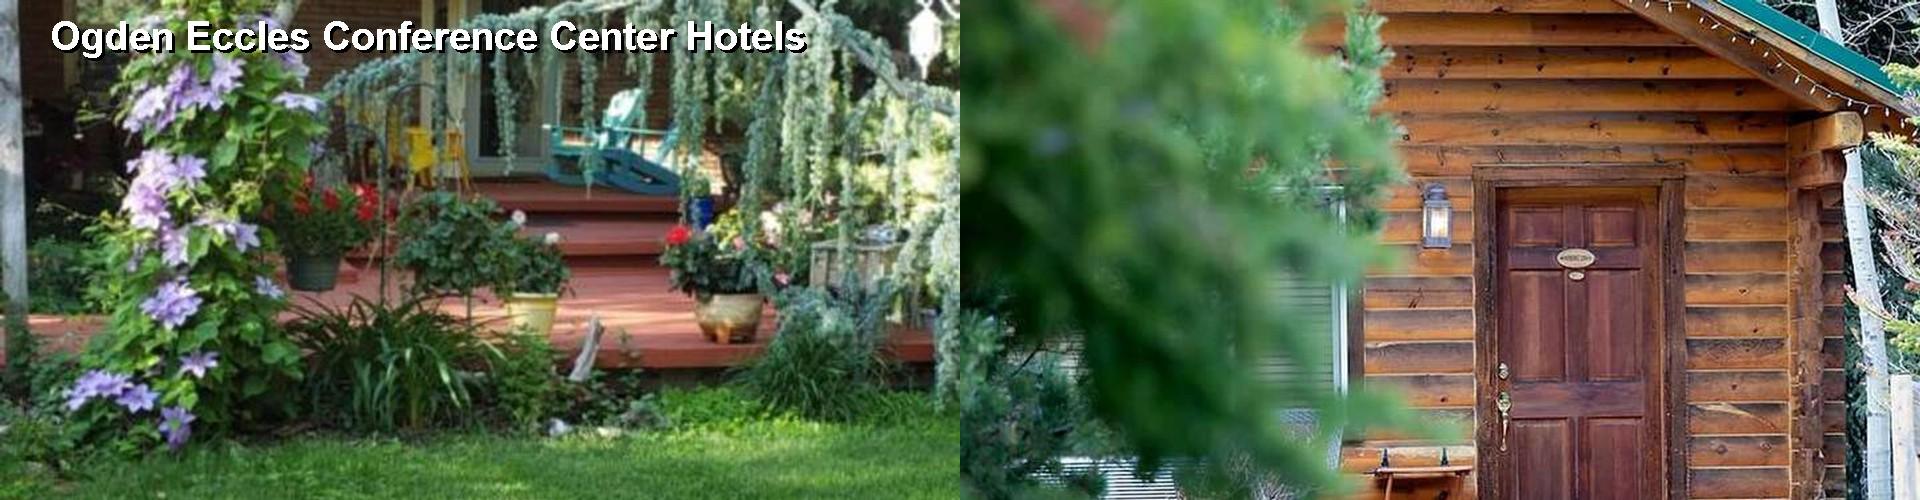 $47+ Hotels Near Ogden Eccles Conference Center UT